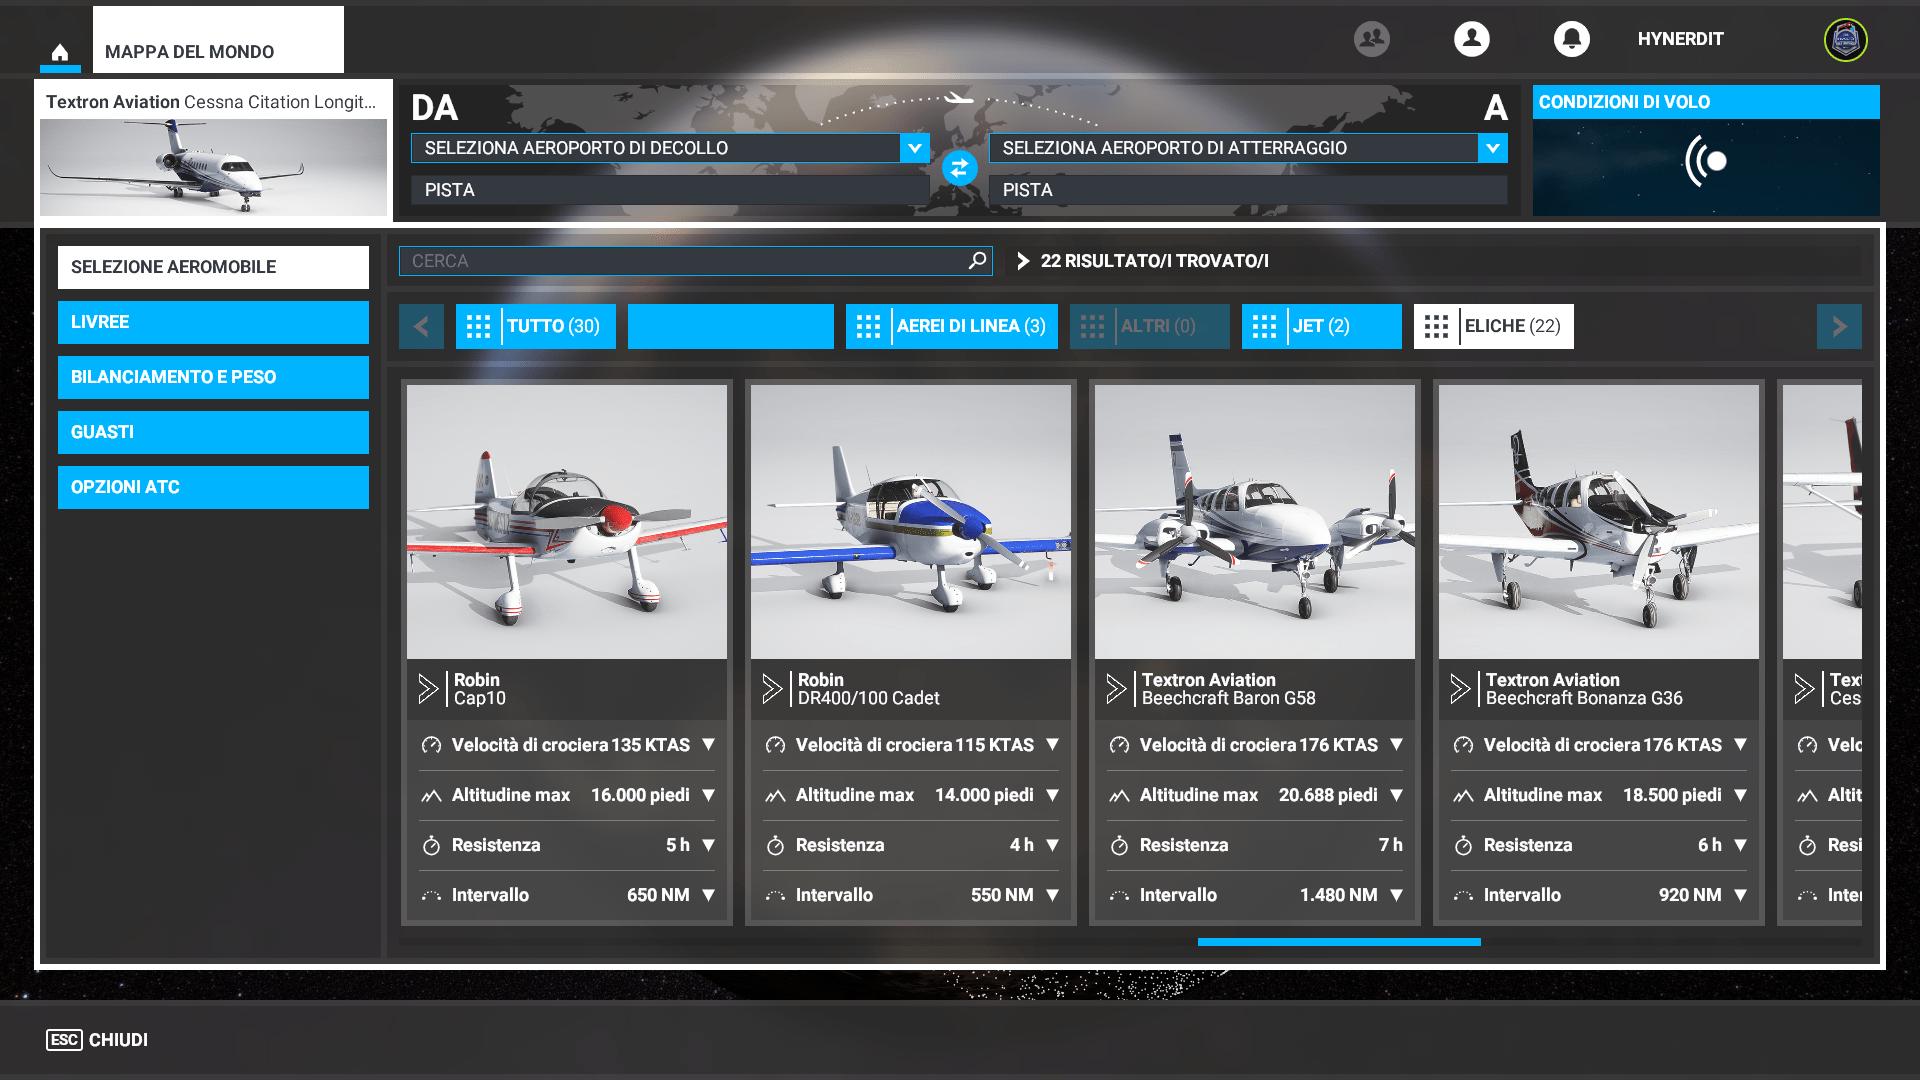 Microsoft Flight Simulator 2020: La Recensione 12 - Hynerd.it